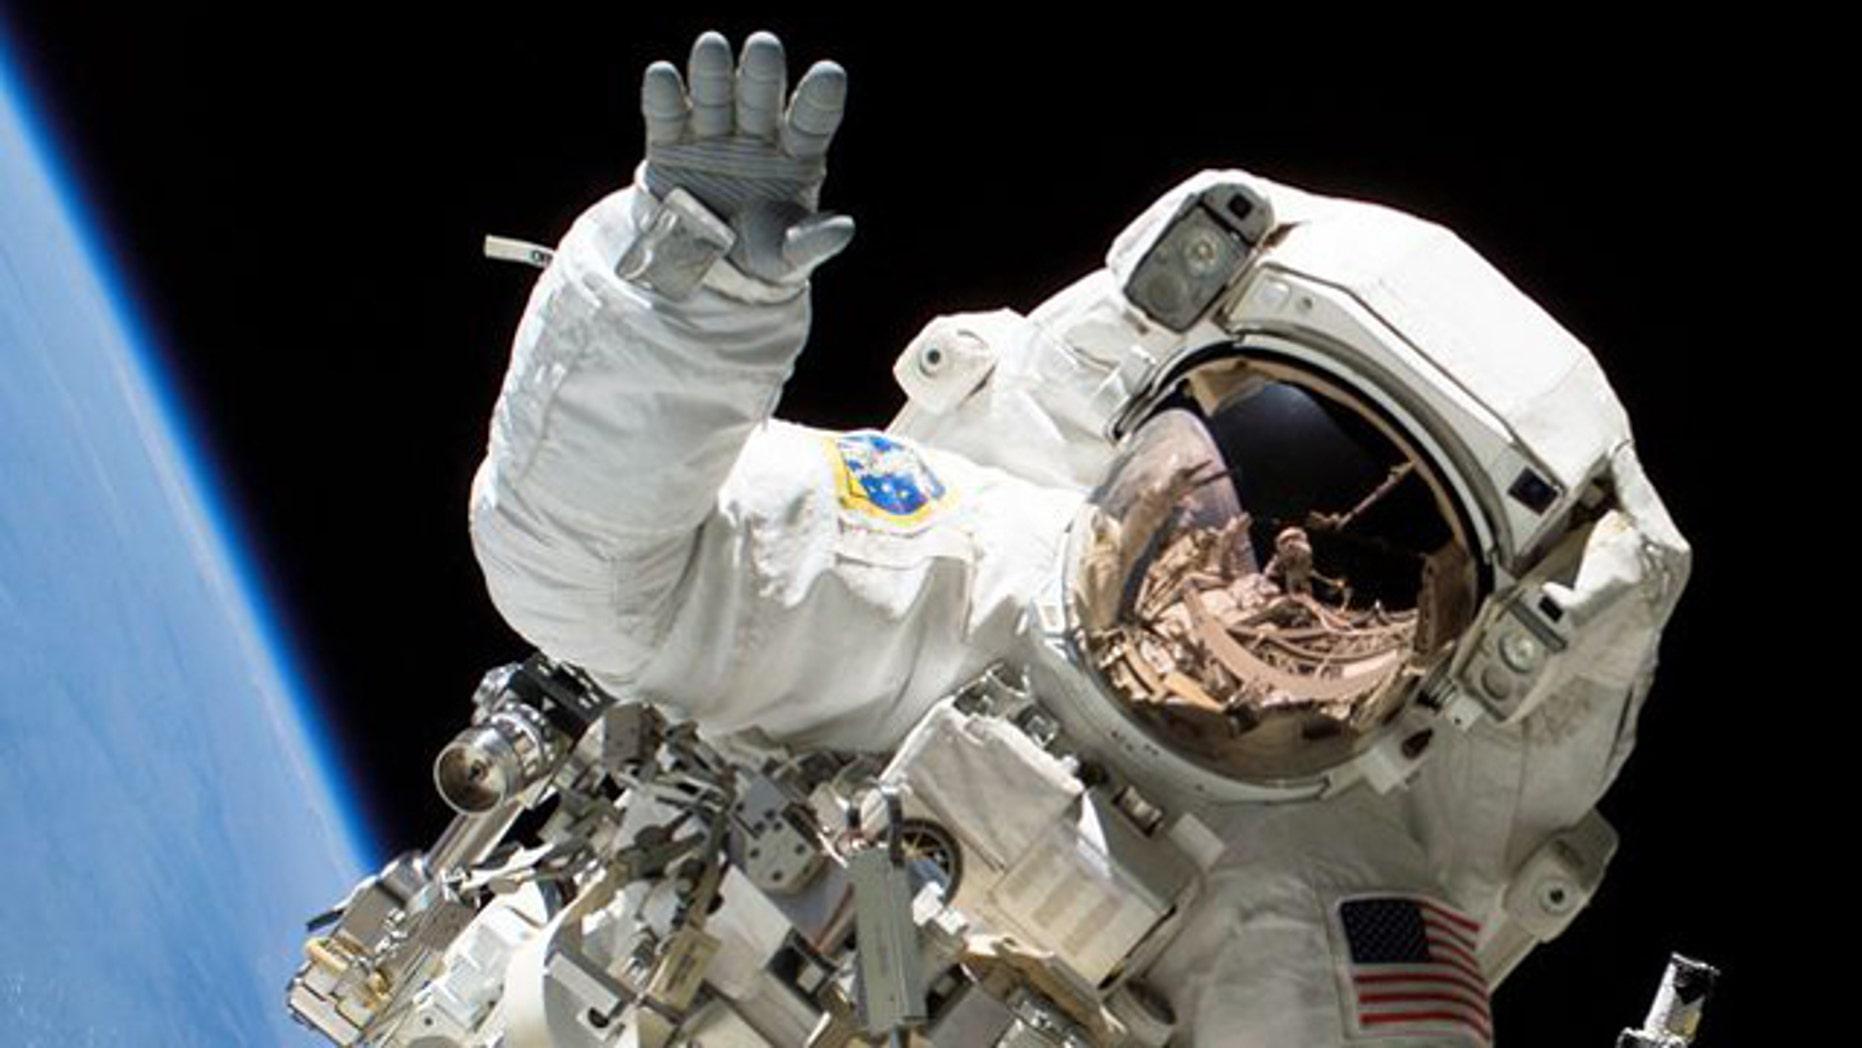 Astronaut Heidemarie M. Stefanyshyn-Piper waves at the camera during a spacewalk.